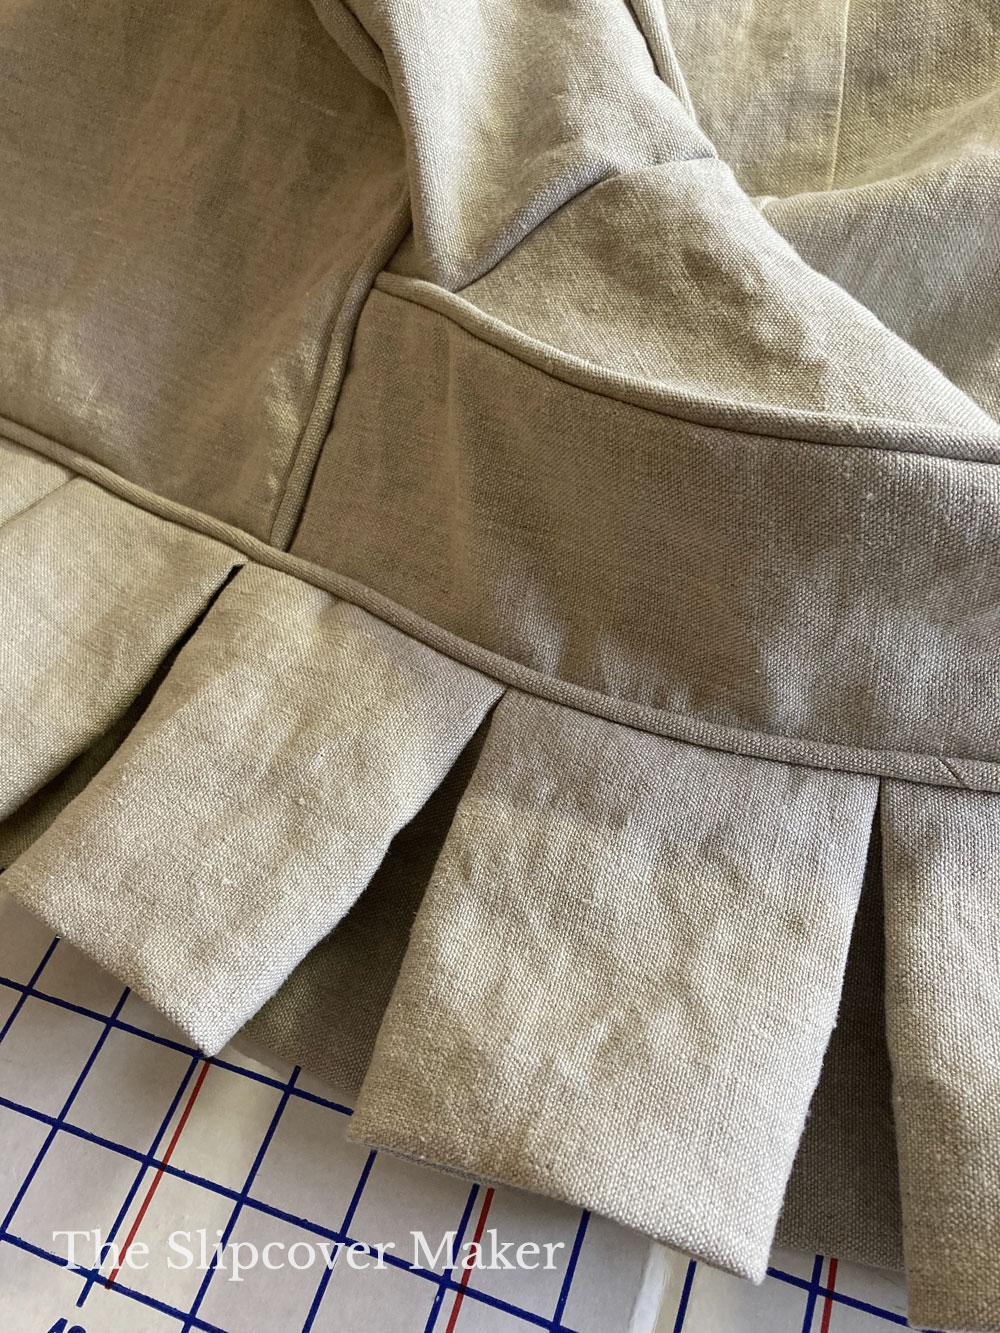 5 Pleated Slipcover Skirt Designs + Lining Tips